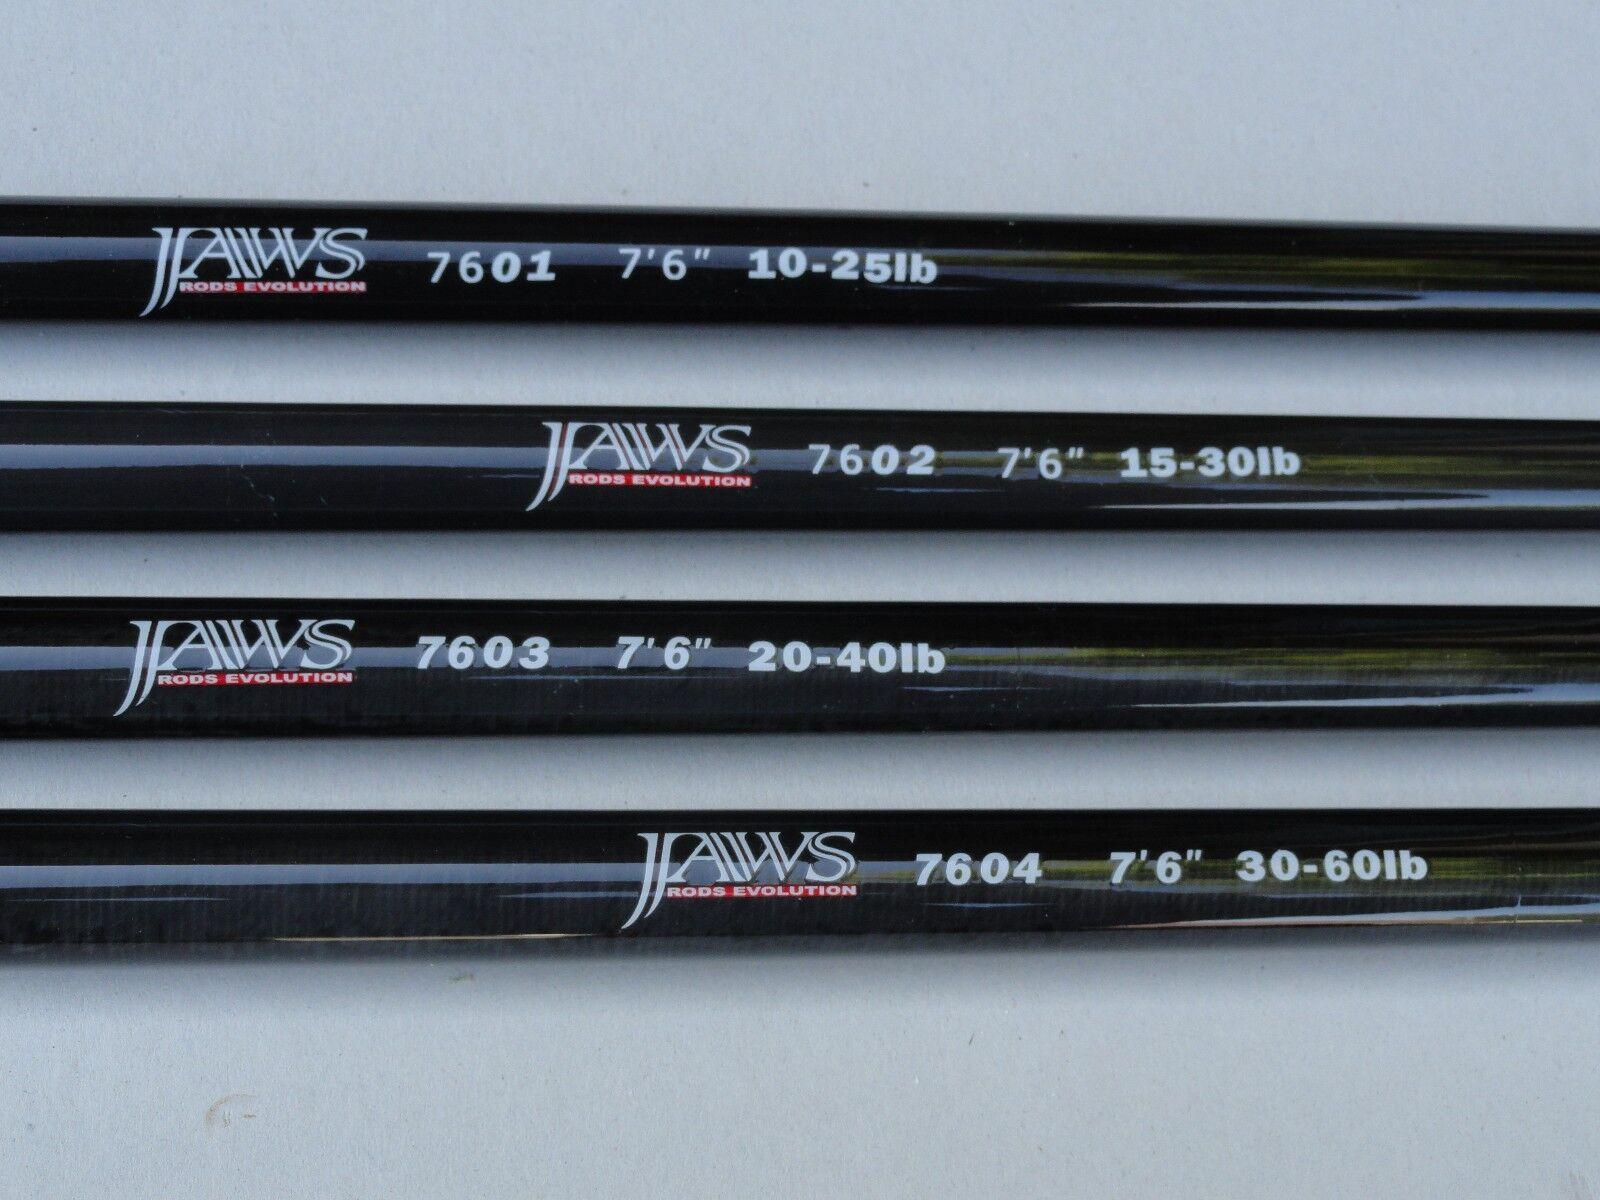 Two x Jaws NANO Saltwater Rod Blank 7'6  Line Rating  15lb - 30lb - 7602 Nano